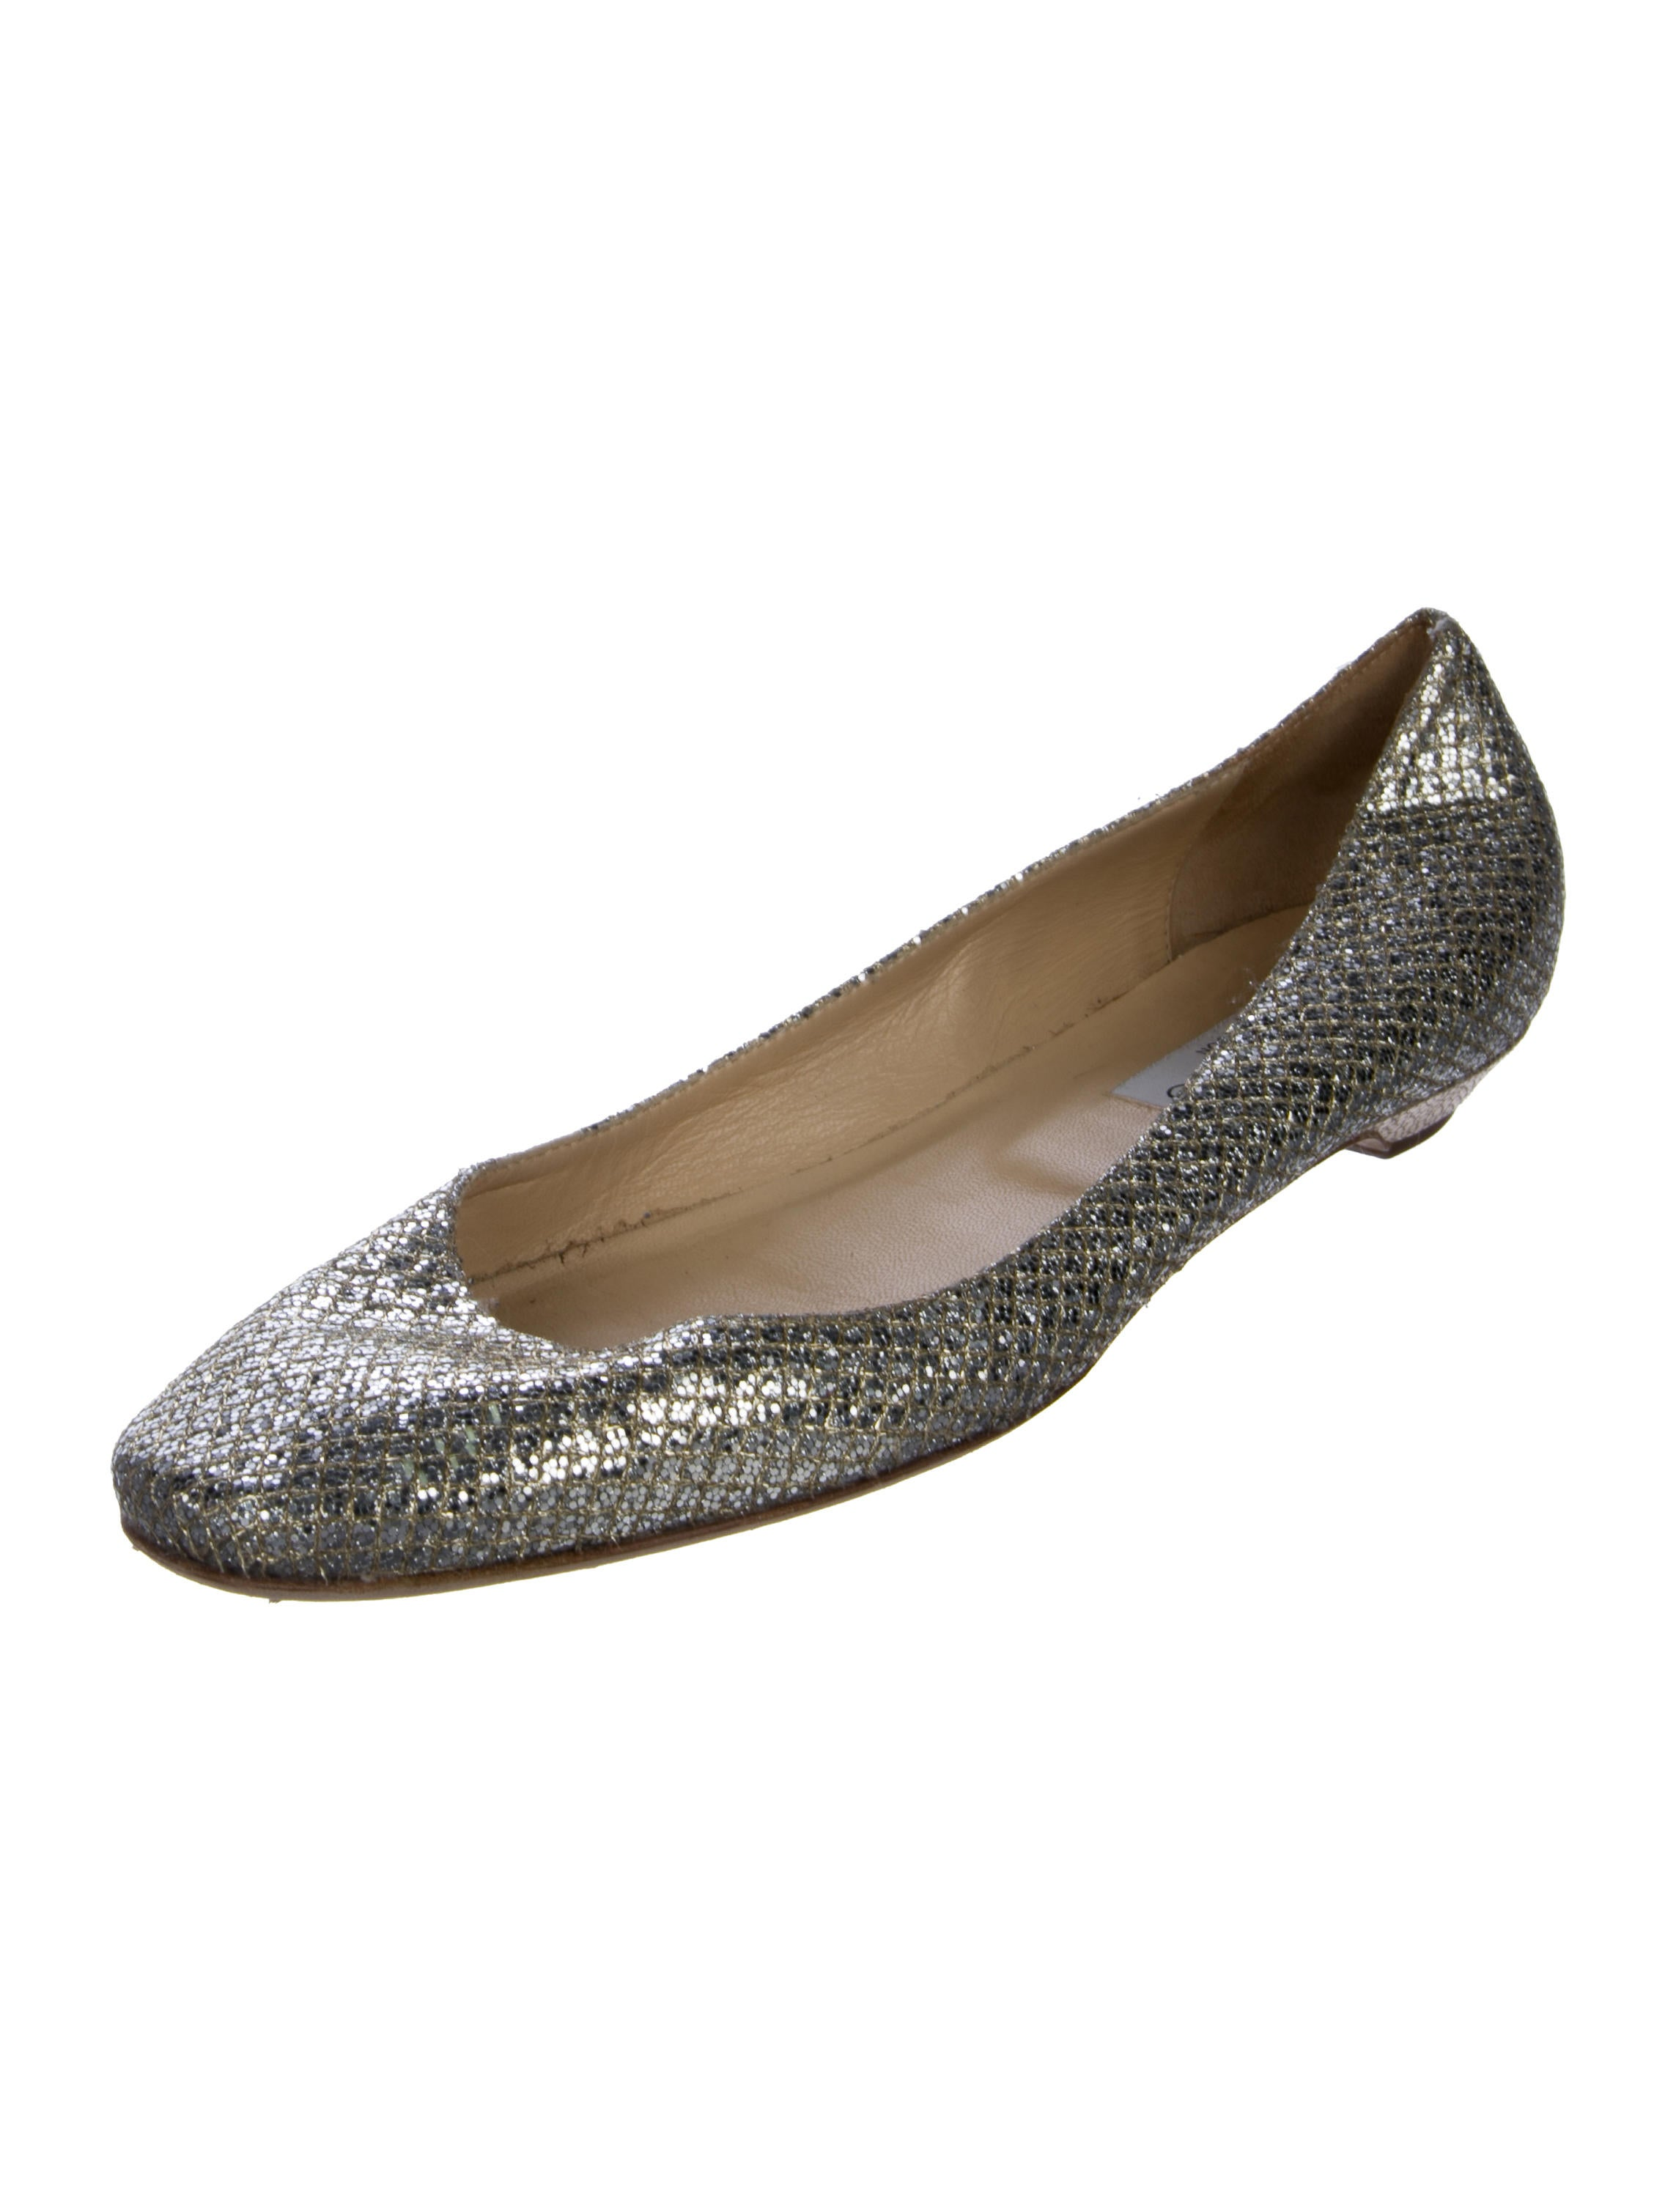 Jimmy Choo Glitter Round-Toe Flats cheap big sale izmGekNWWY